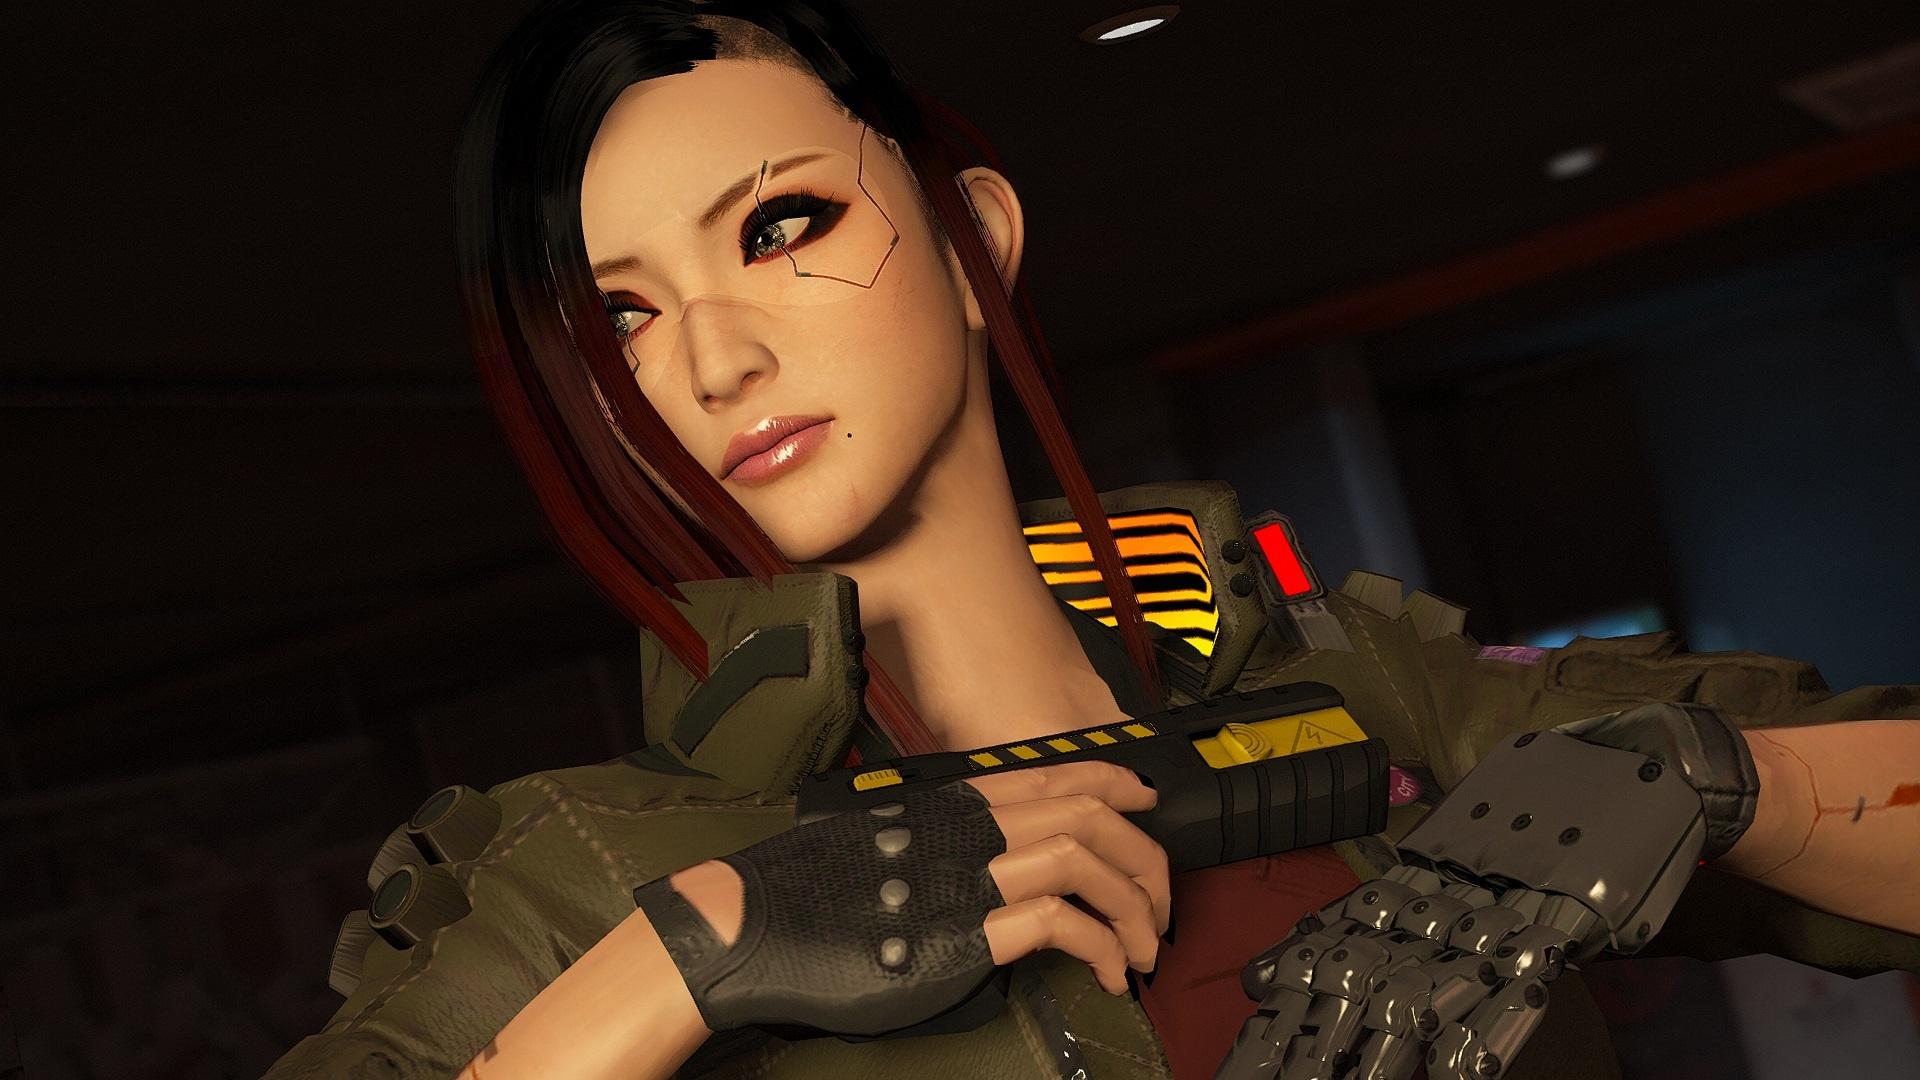 Cyberpunk 2077 Personnalisation Personnage